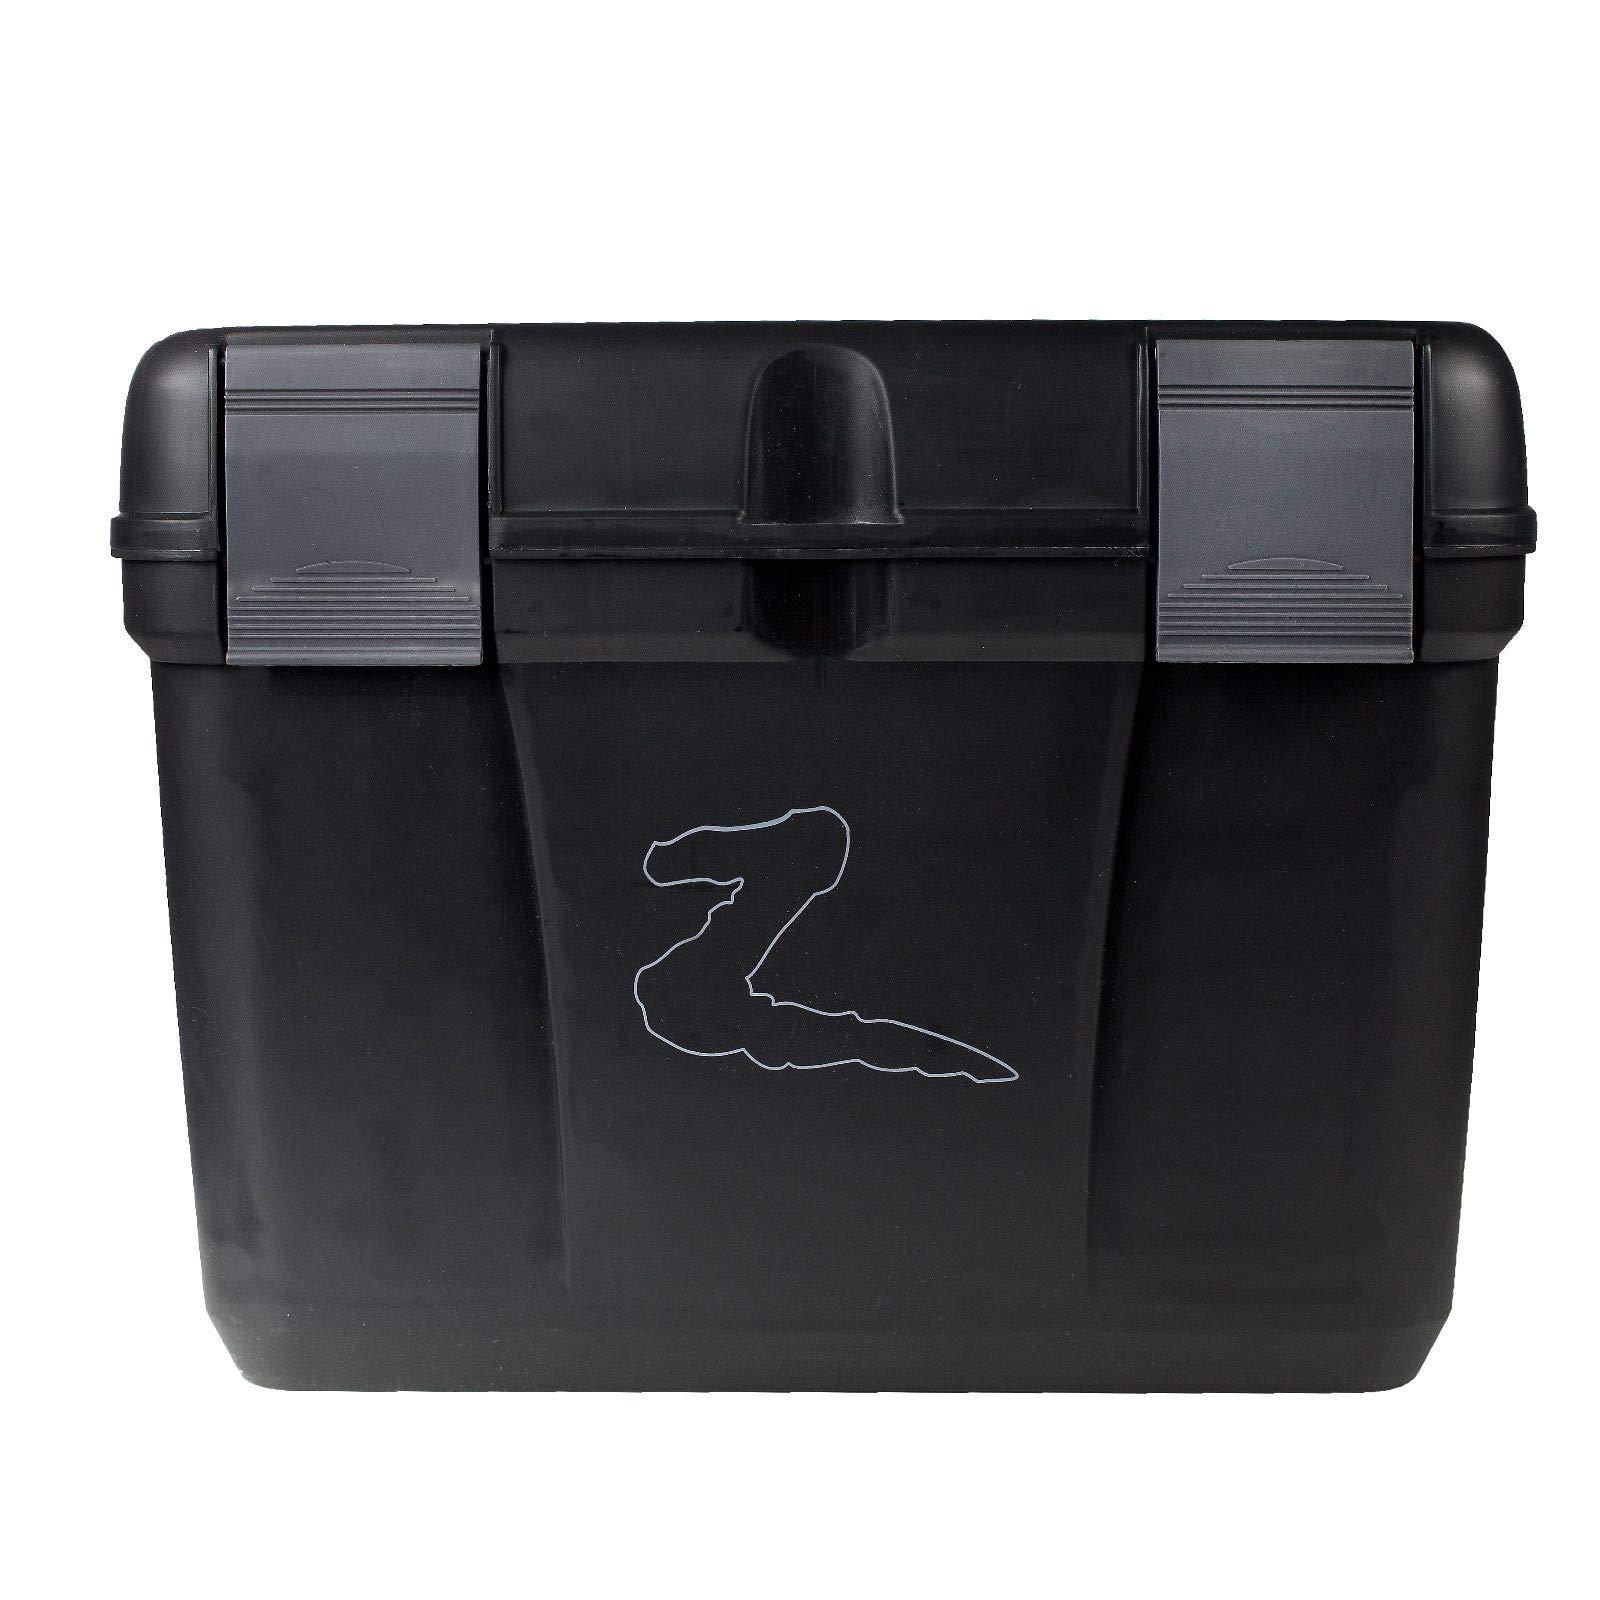 Horze Smart Grooming Box, Black